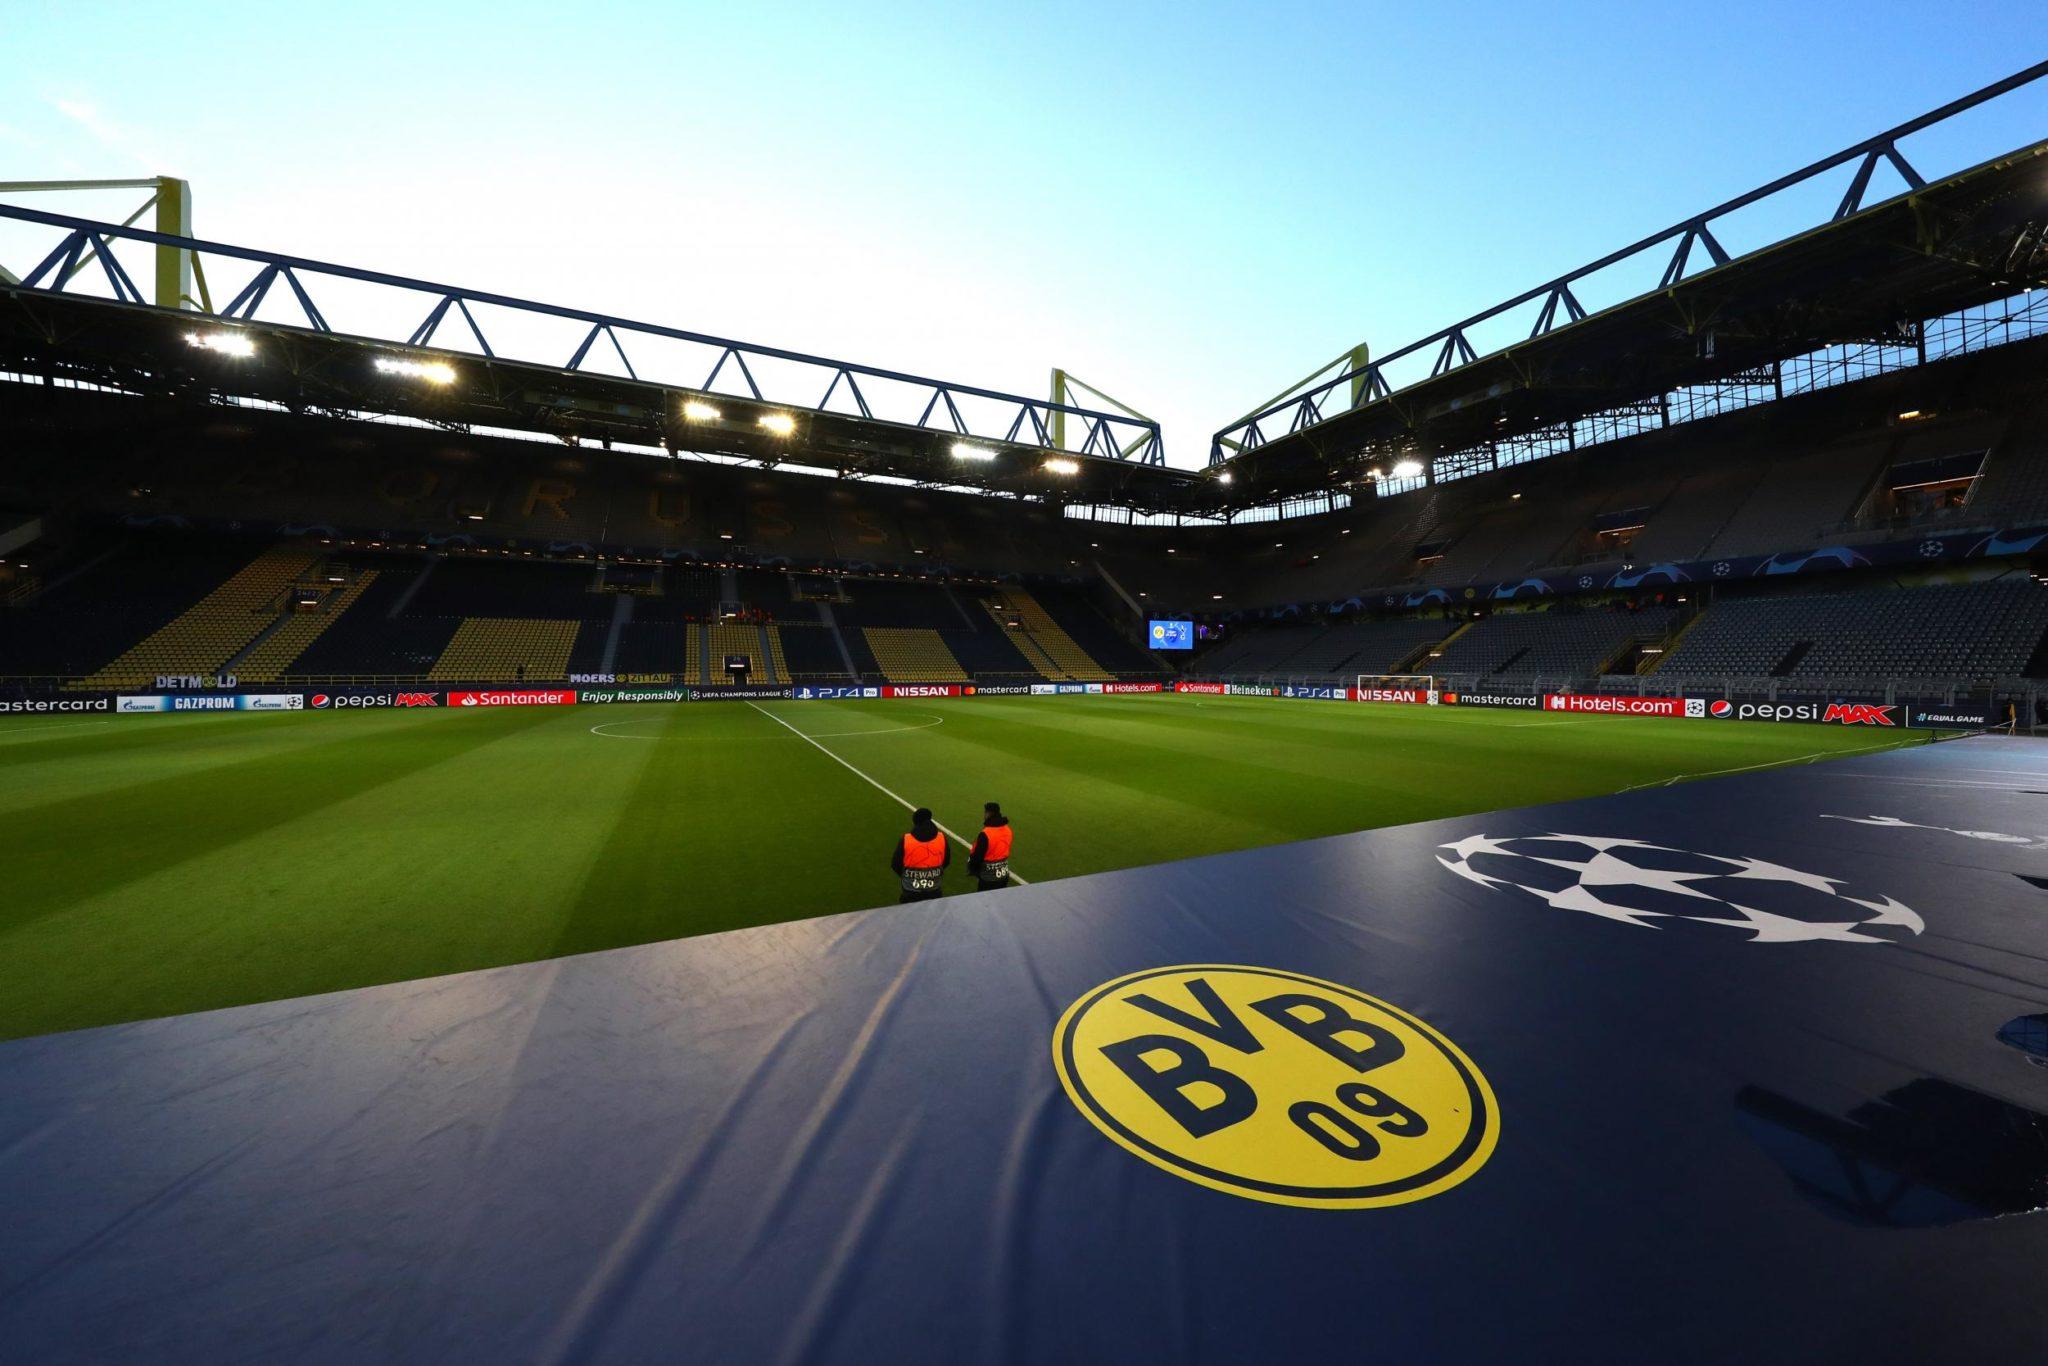 Champions League, Barcelona, Borussia Dortmund, Messi